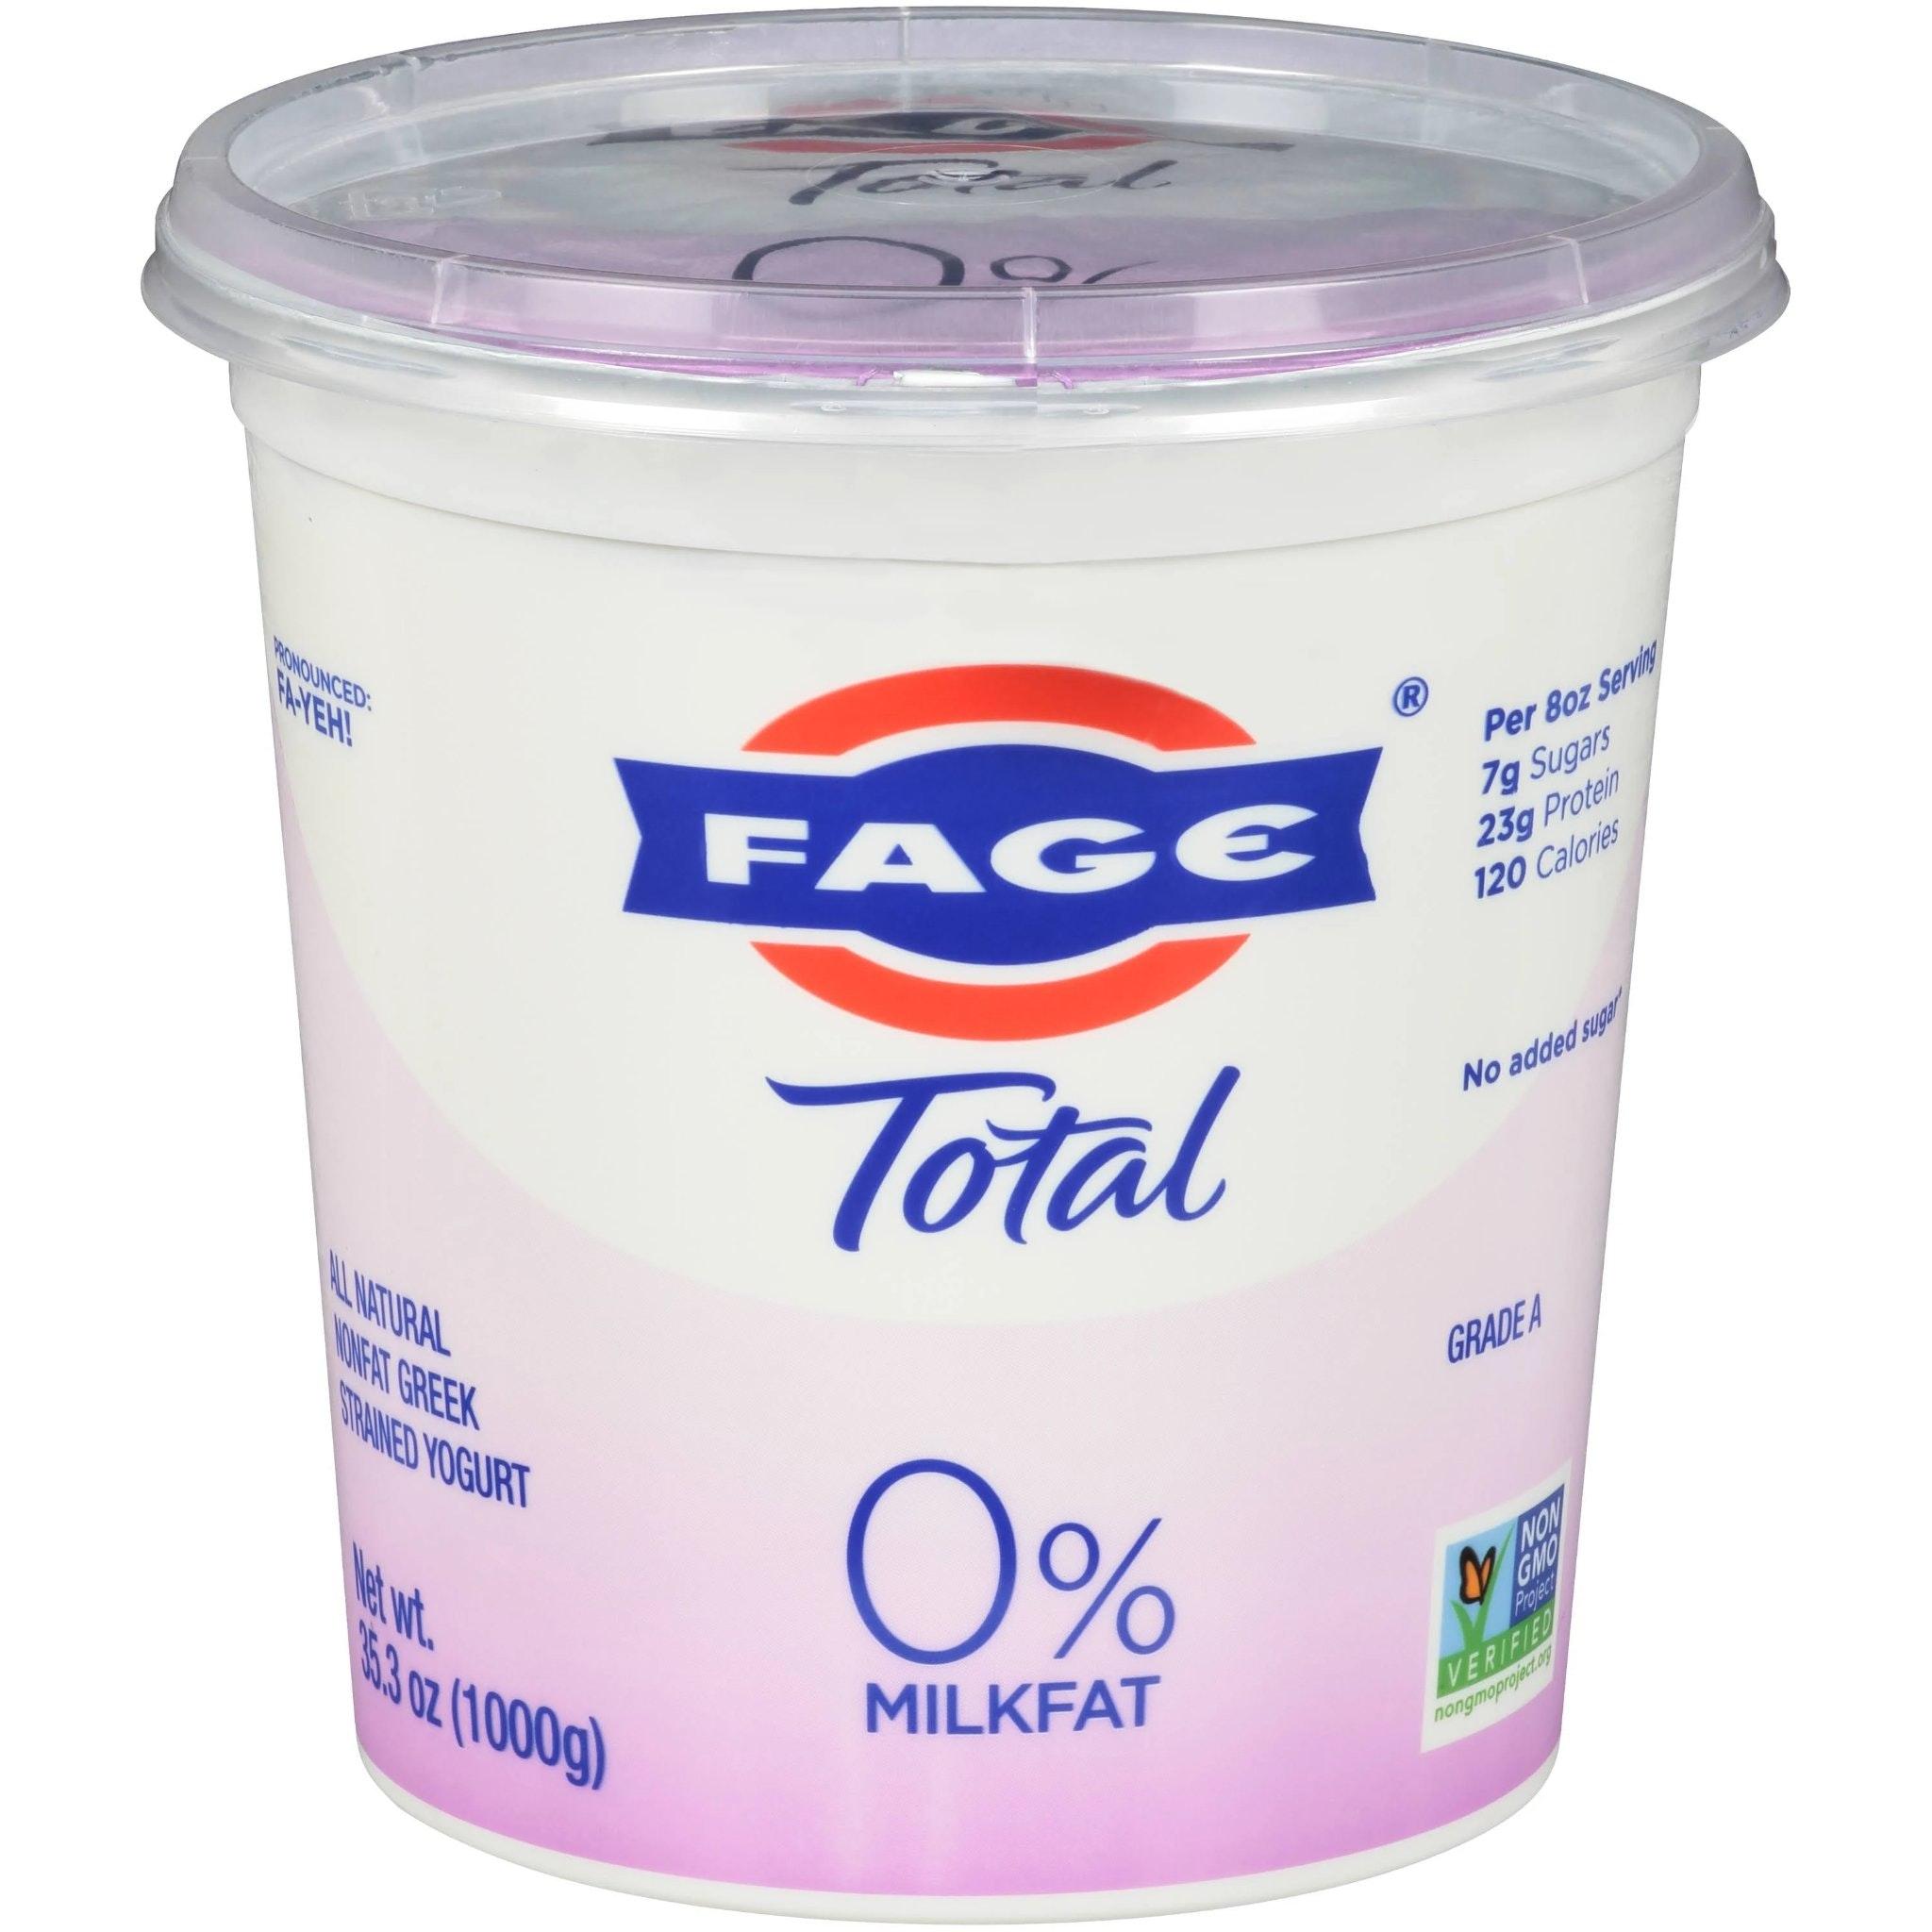 Fage Total Yogurt